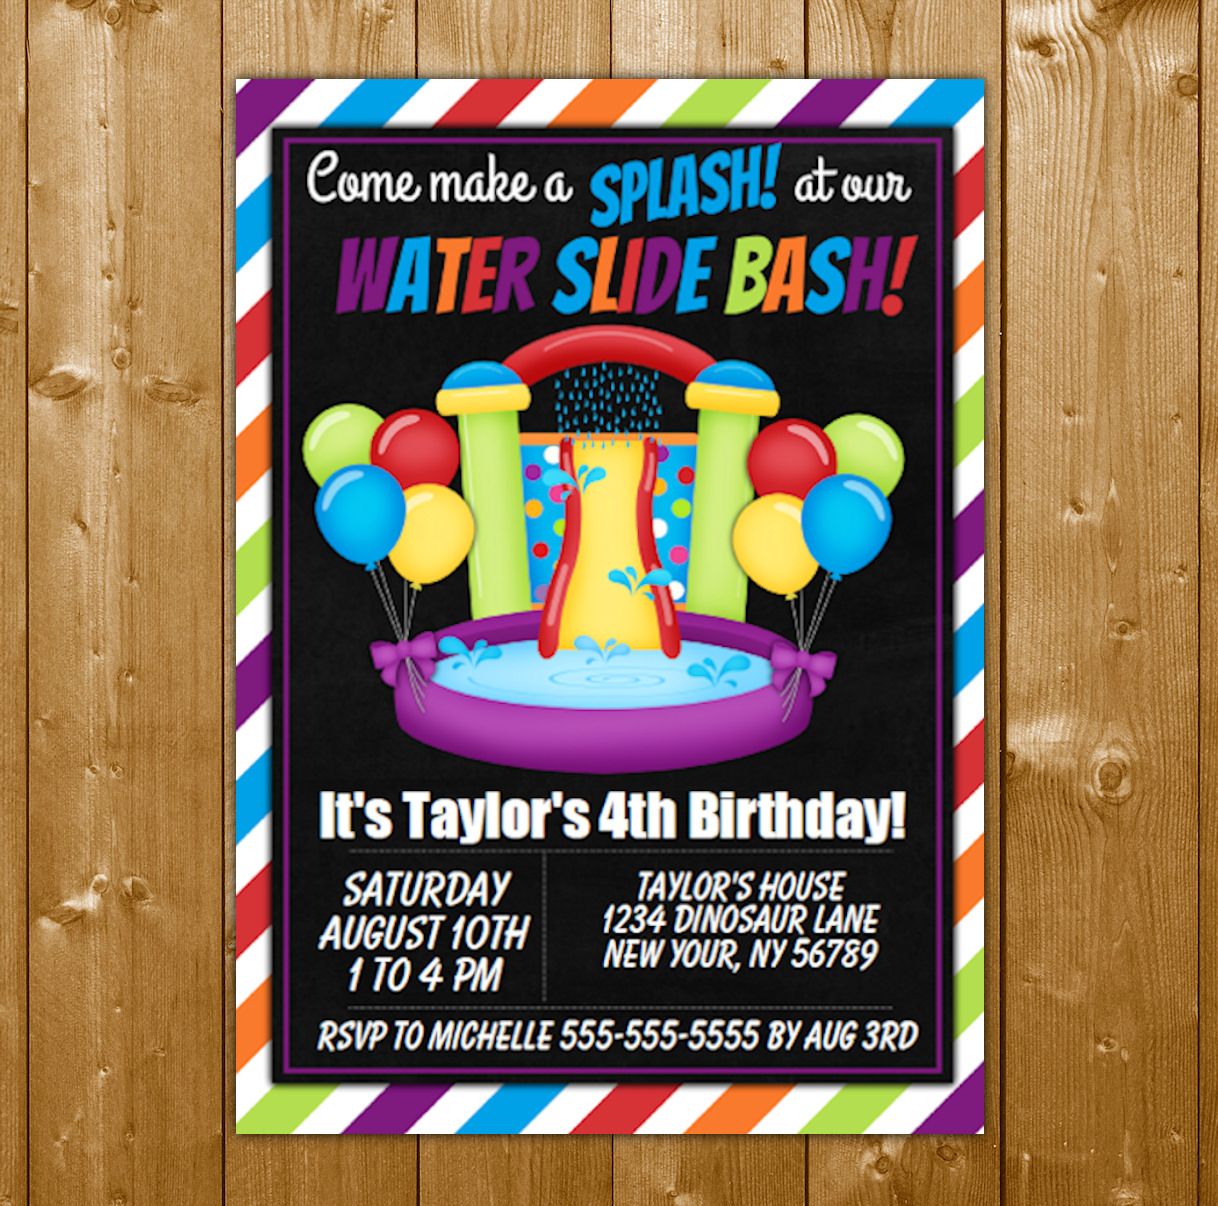 water slide party invitation printable digital download birthday party invite birthday party invite